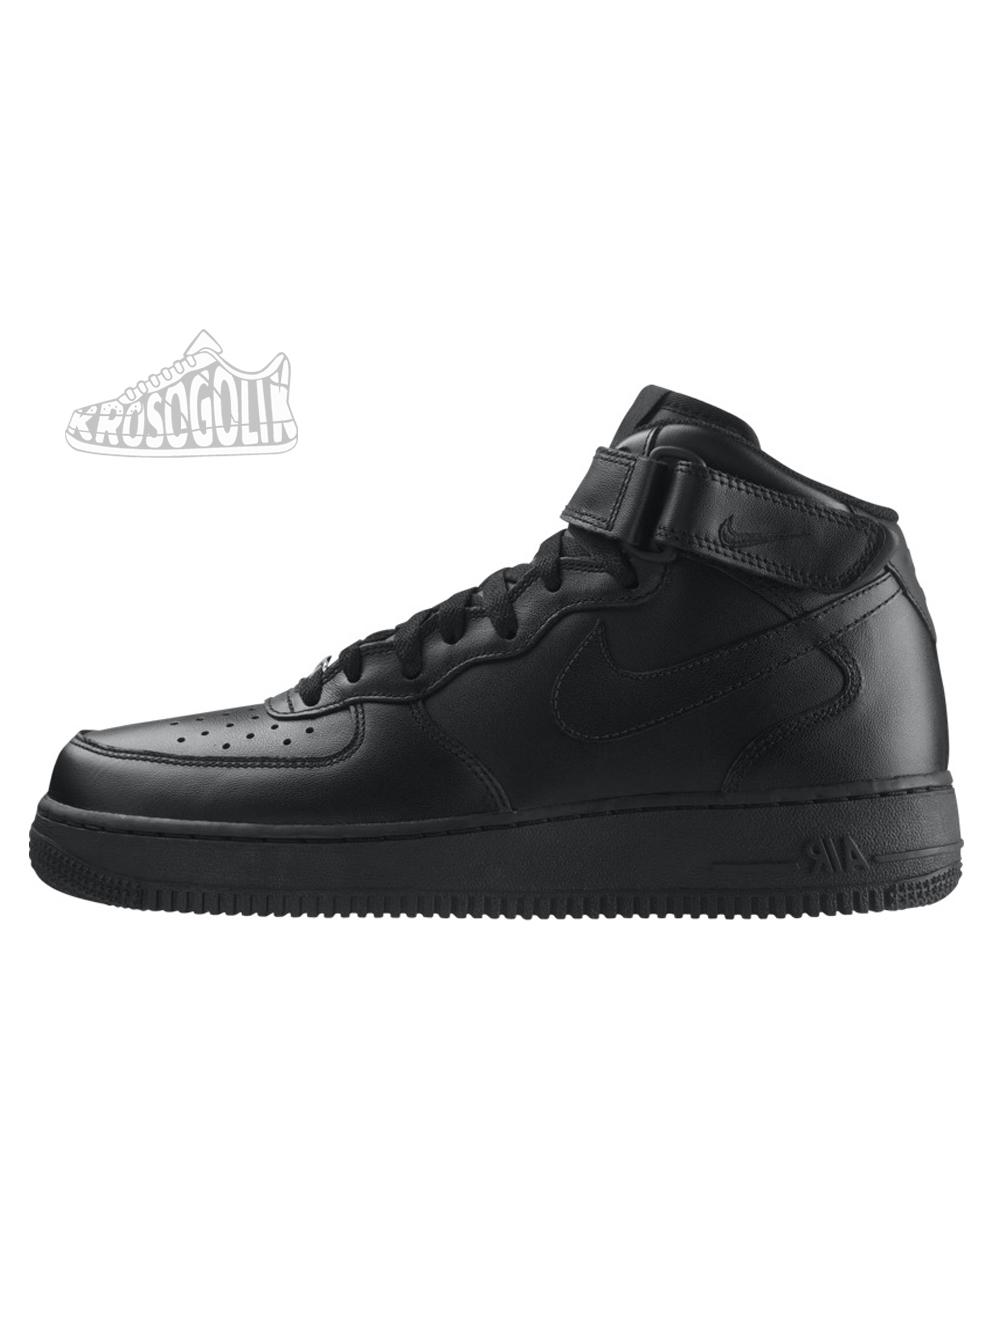 dcd32e3a60d Купить мужские кроссовки Nike Air Force 1 Mid '07 на krosogolik.com